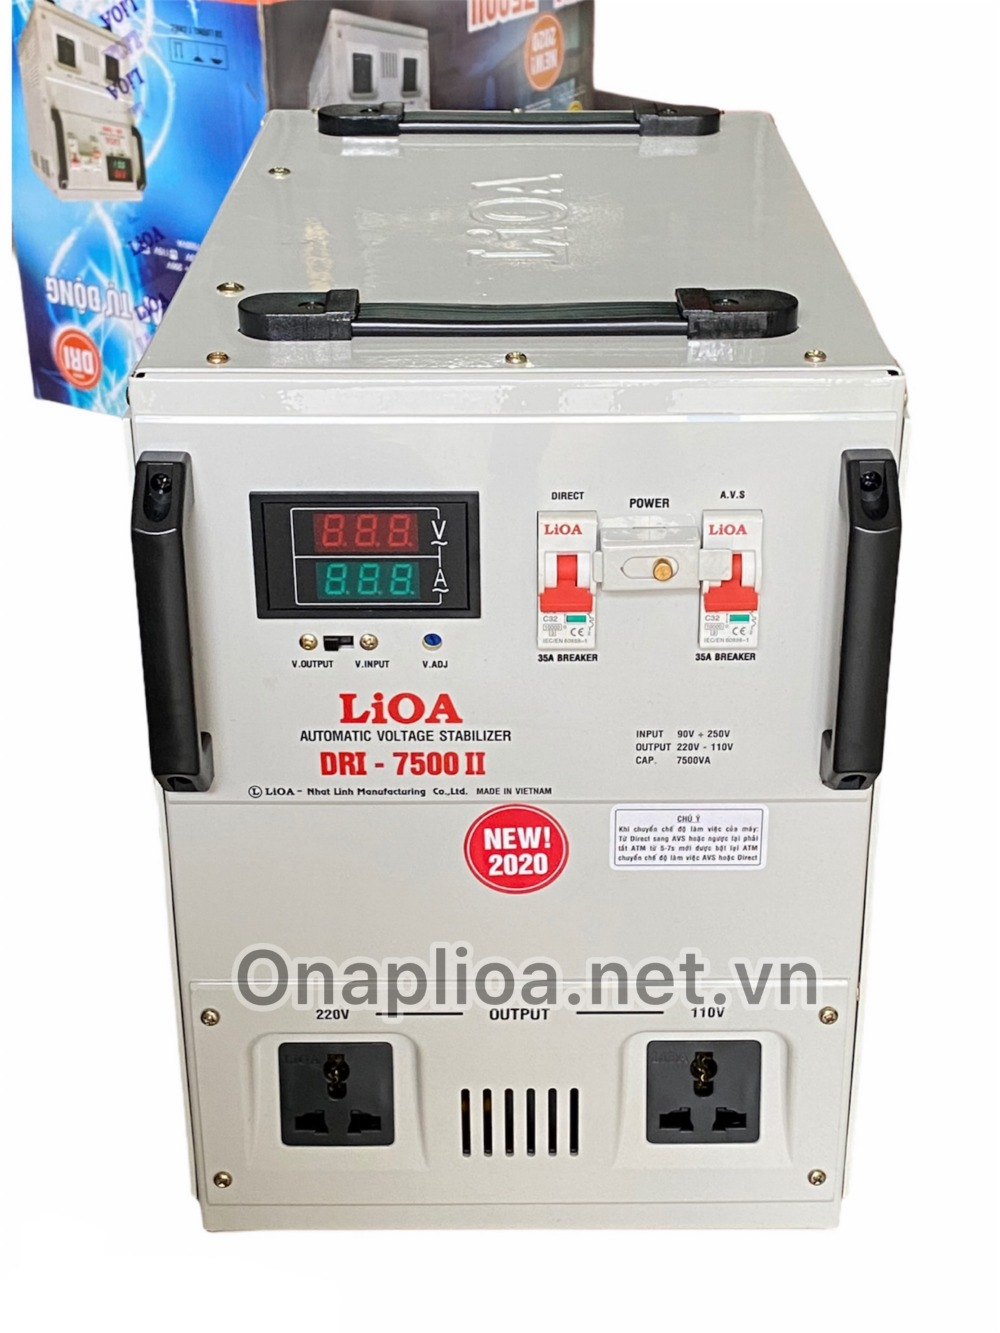 ON AP LIOA DRI-7500II